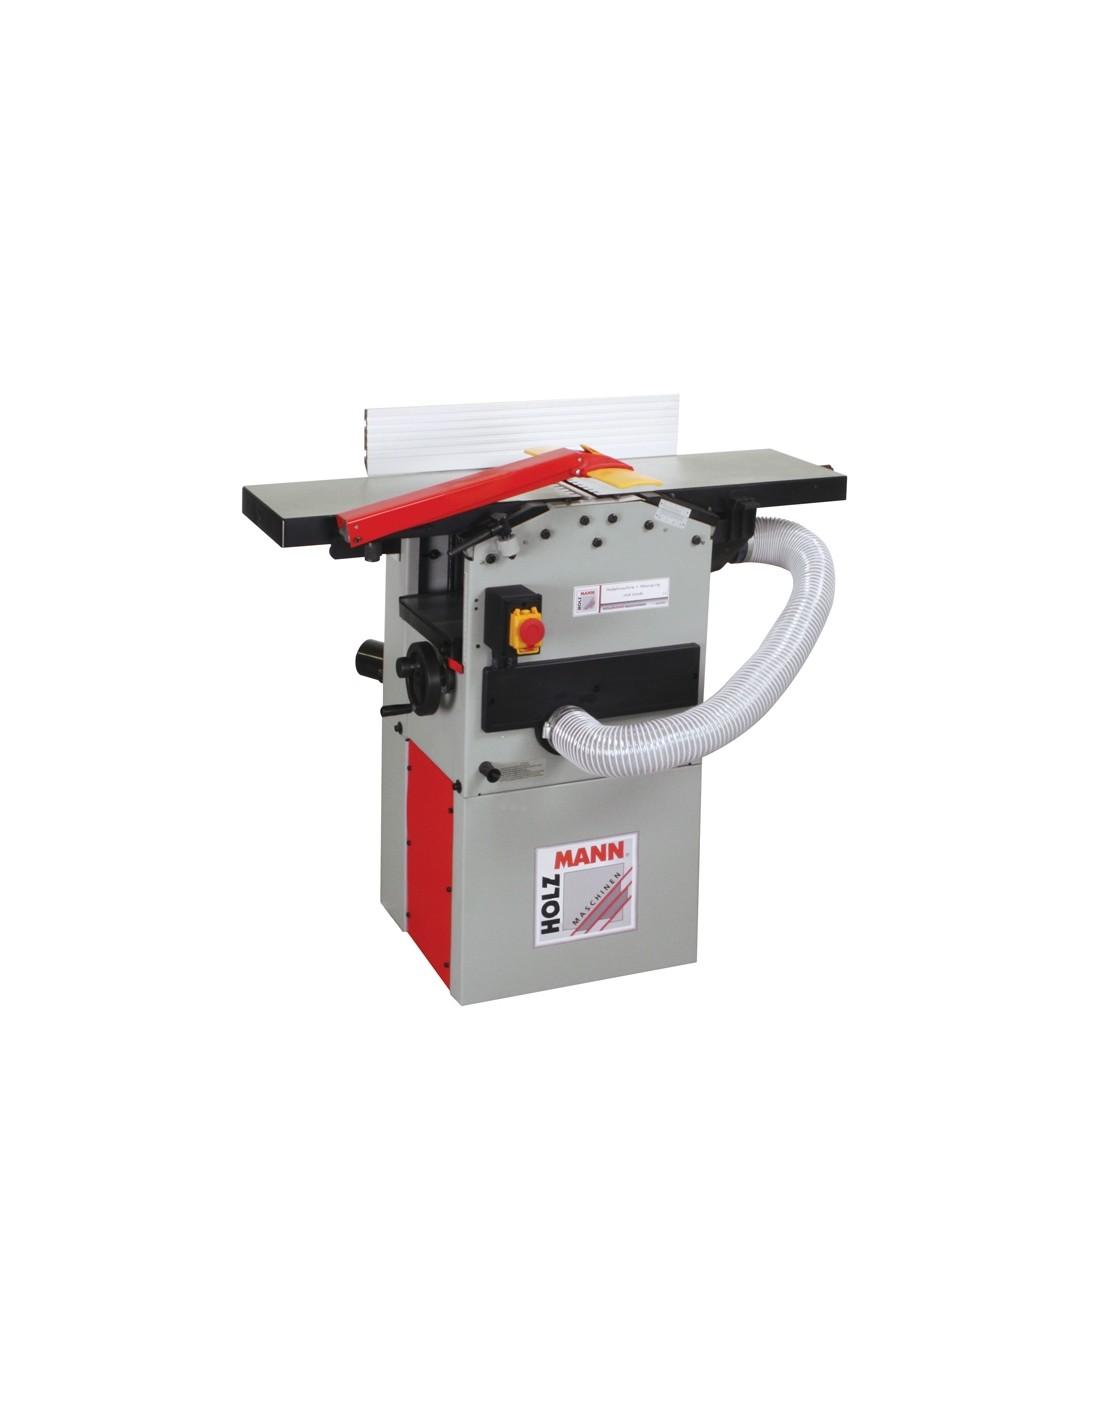 Masina pentru rindeluire si degrosare Holzmann HOB 260ABS - 400 V